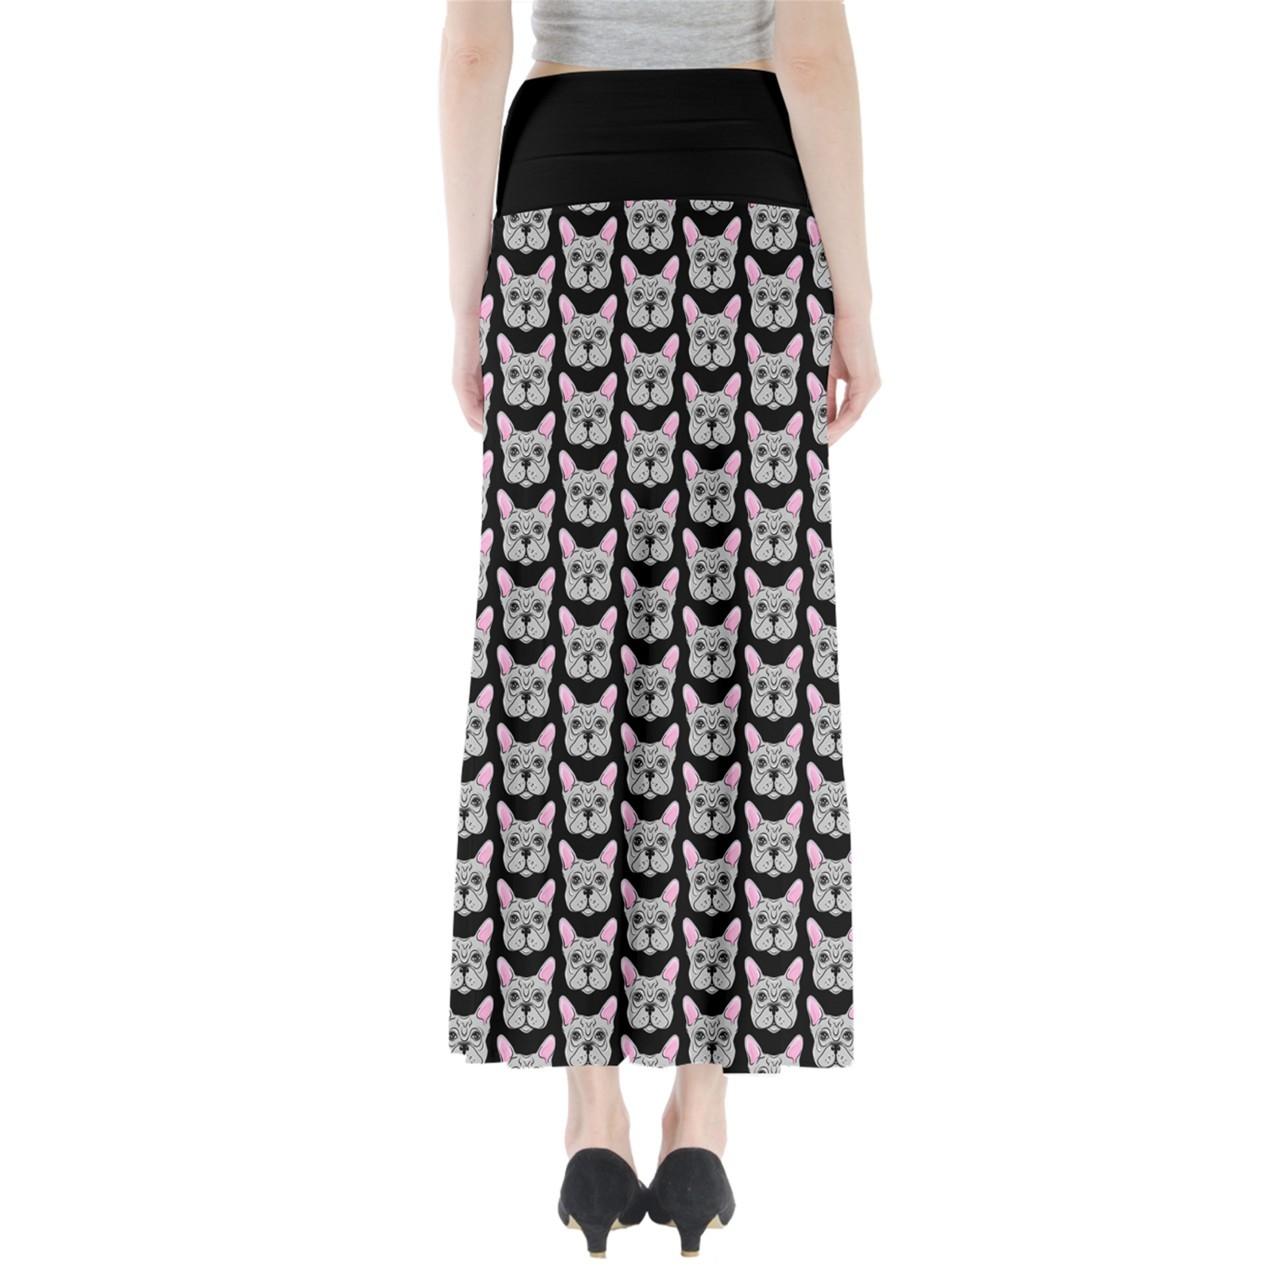 Women's Funny French Bulldog Dog Printed Stretchy Fit Maxi Skirt (XS-3XL, Black)